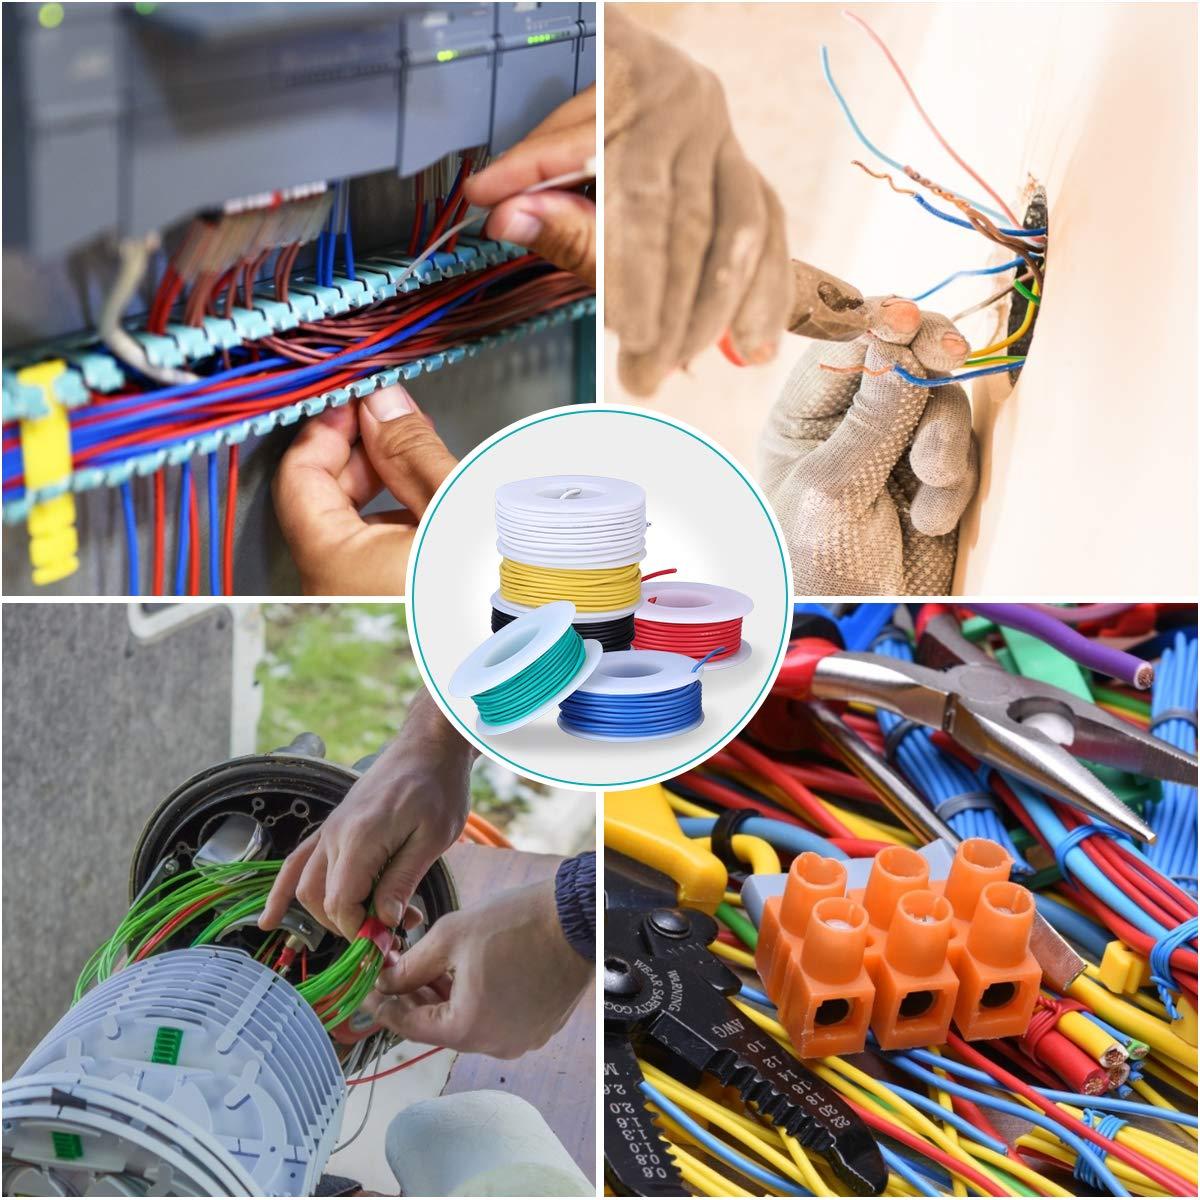 6 Carretes 10 Metros 22 AWG Cable S/ólido Cable de Cobre Esta/ñado Cable Flexible de Silicona Alambres El/éctrico con 24 pz Tubo Termorretr/áctil 36 pz Amarre Cable 1pz Mini Pelacables